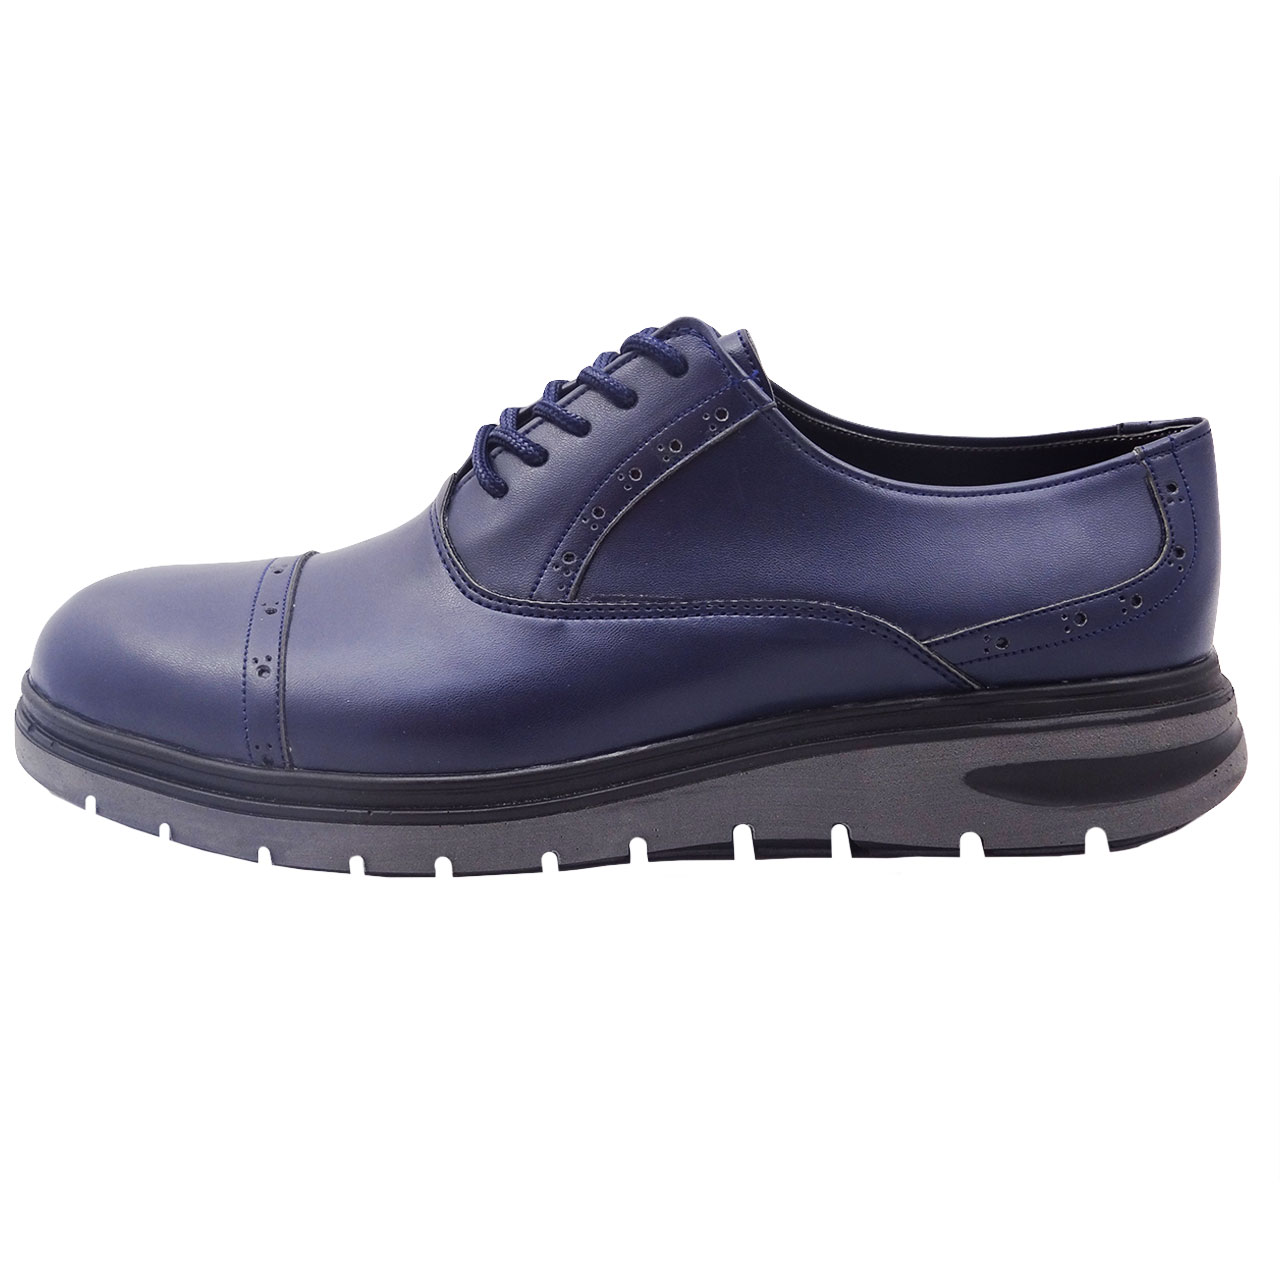 کفش چرمی مدل برت کد A12